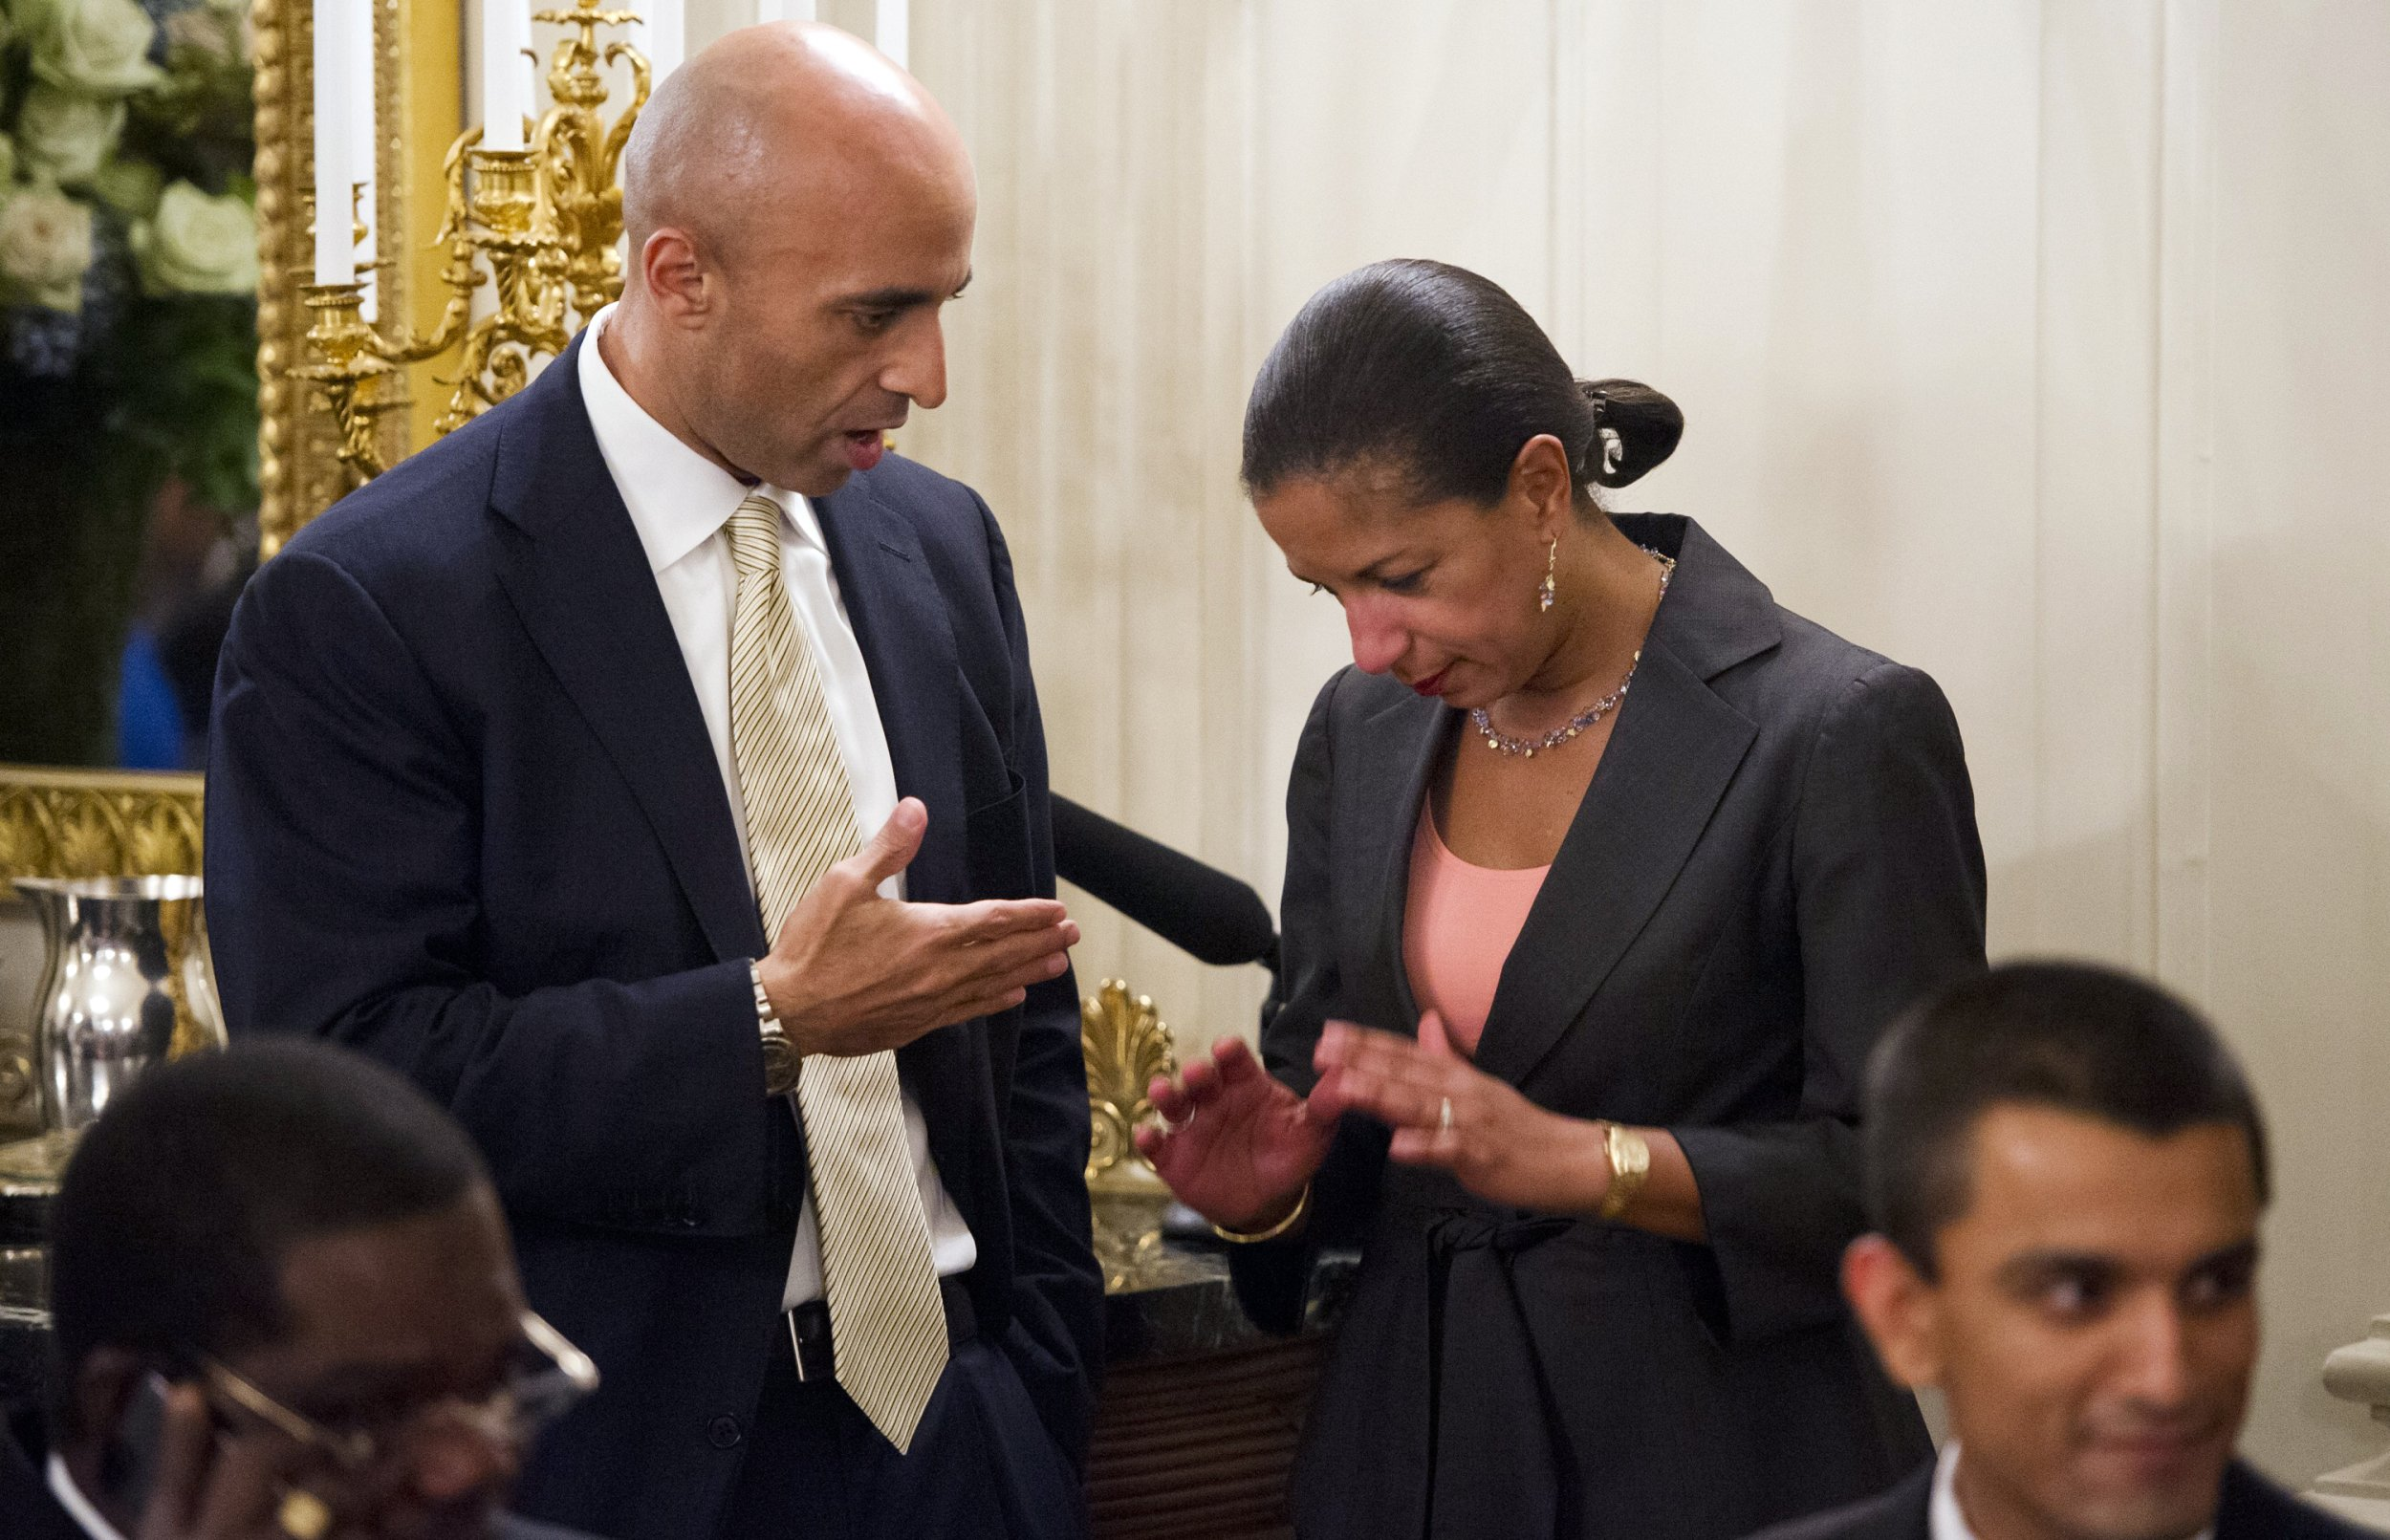 National Security Adviser Susan Rice (R) speaks with Yousef Al Otaiba